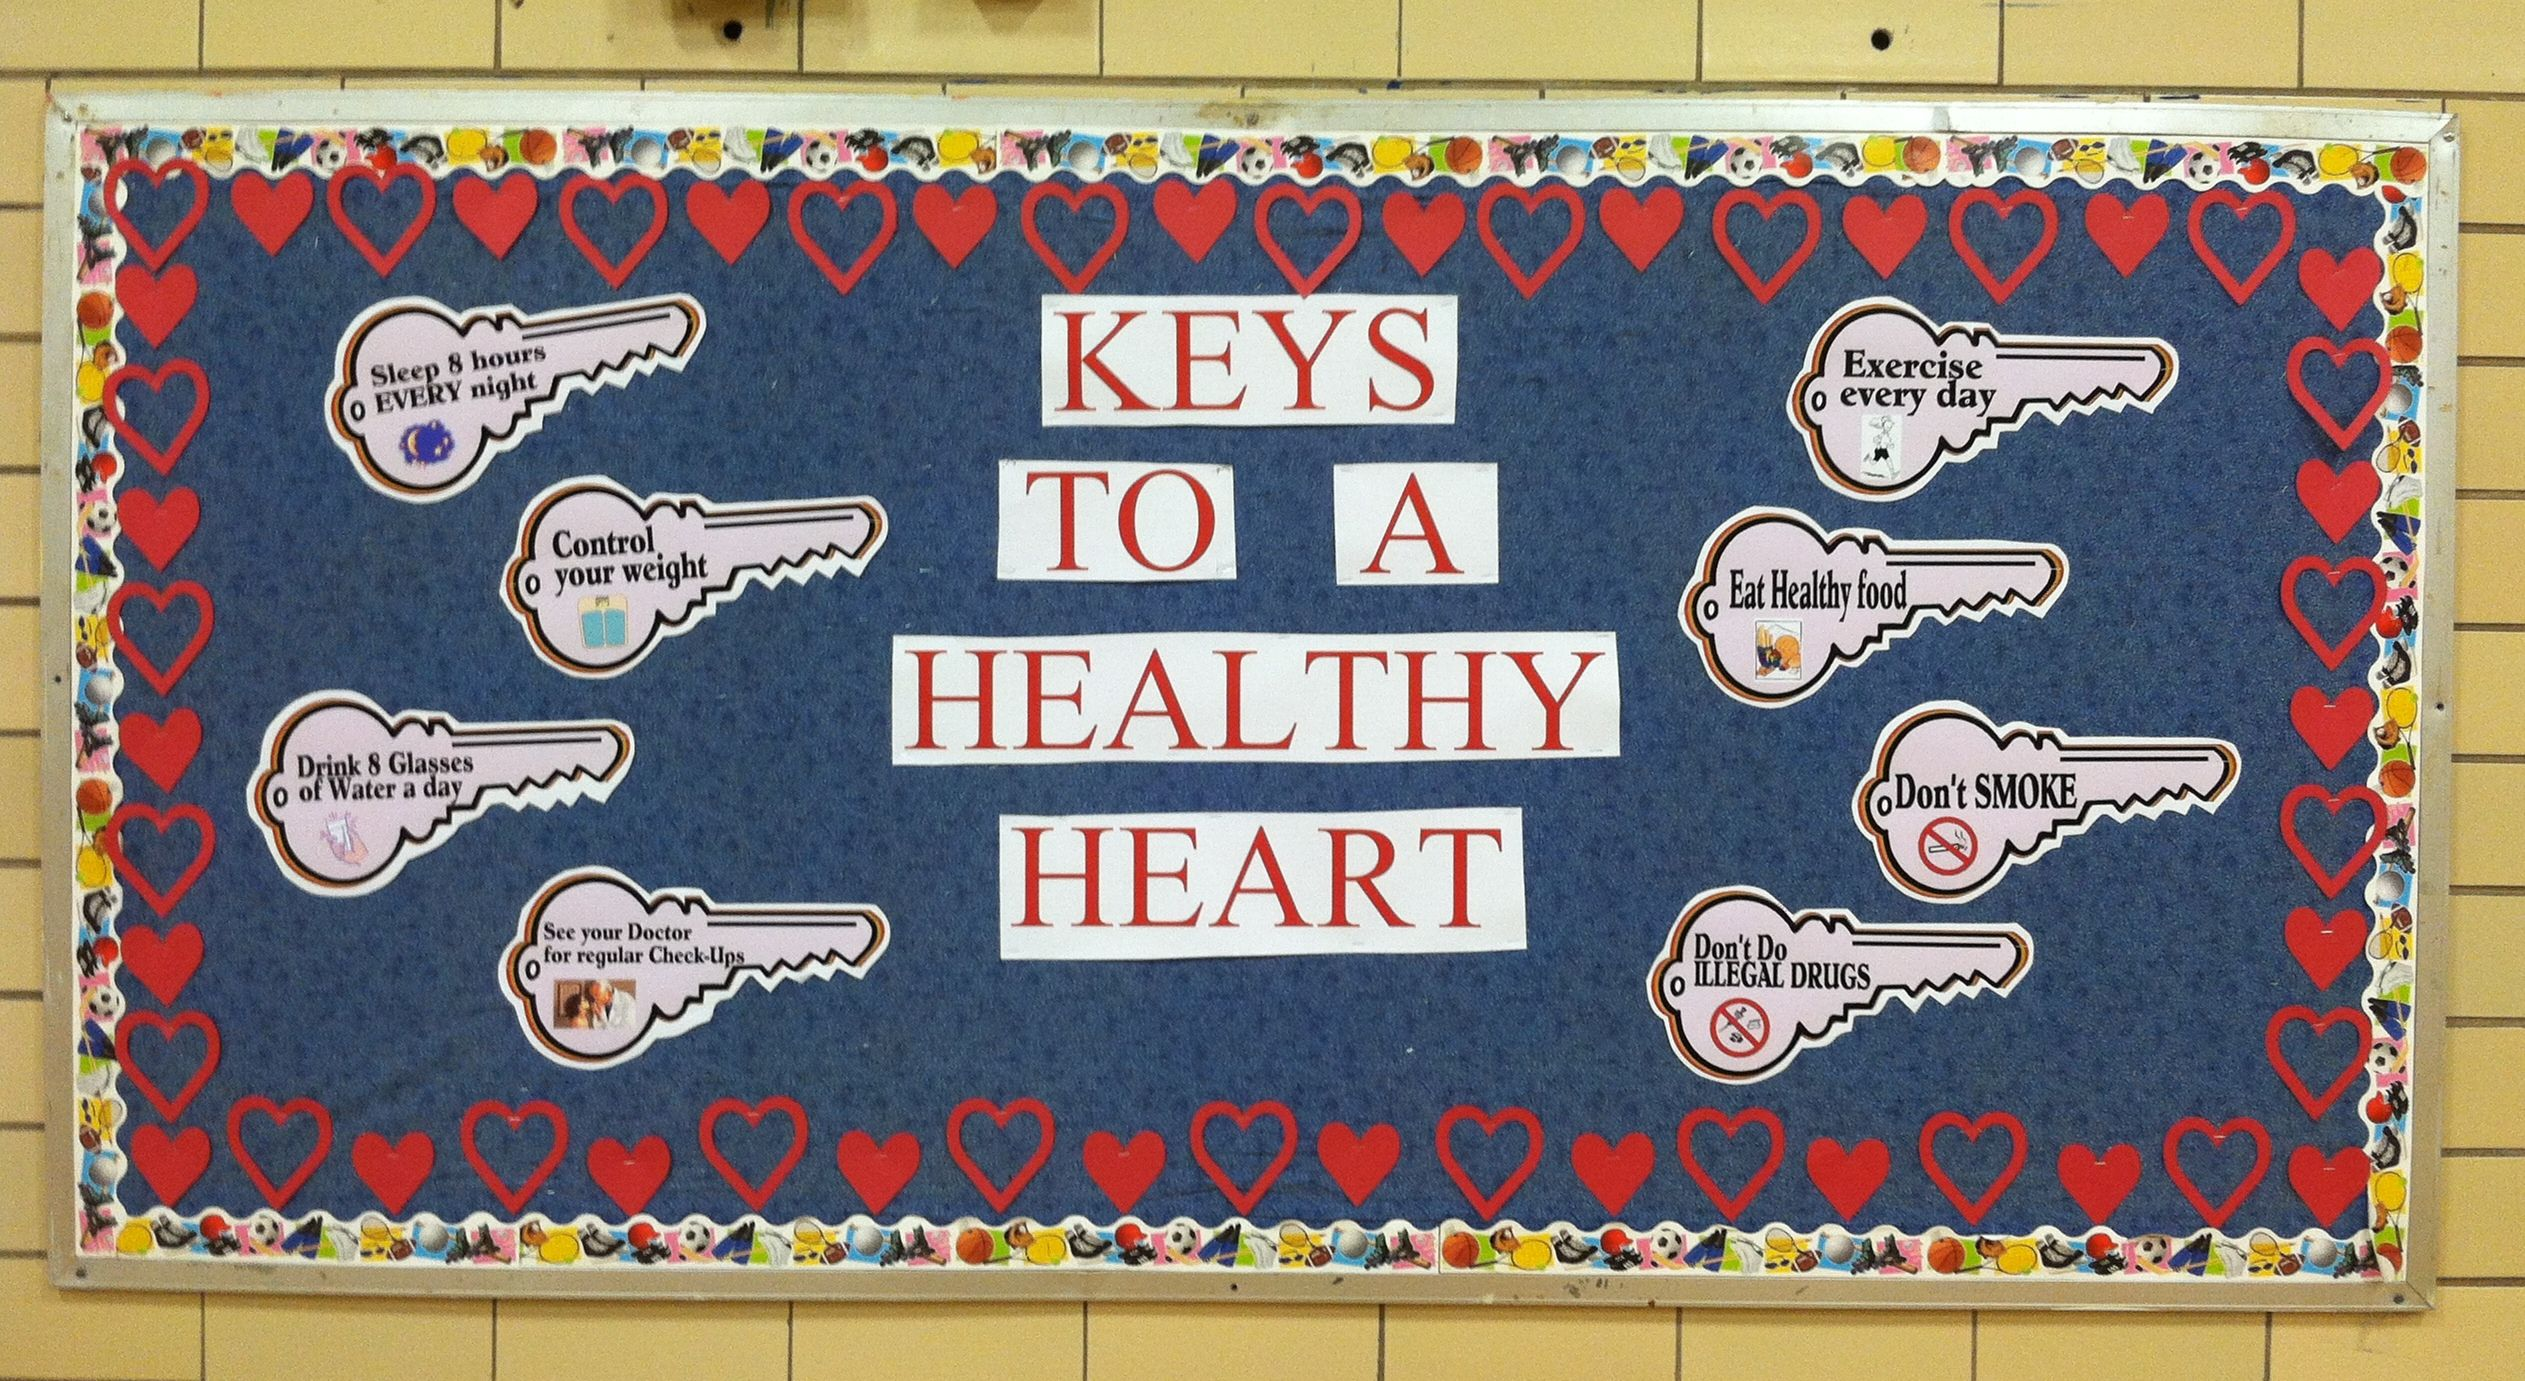 Keys to a Healthy Heart bulletin board. Health bulletin